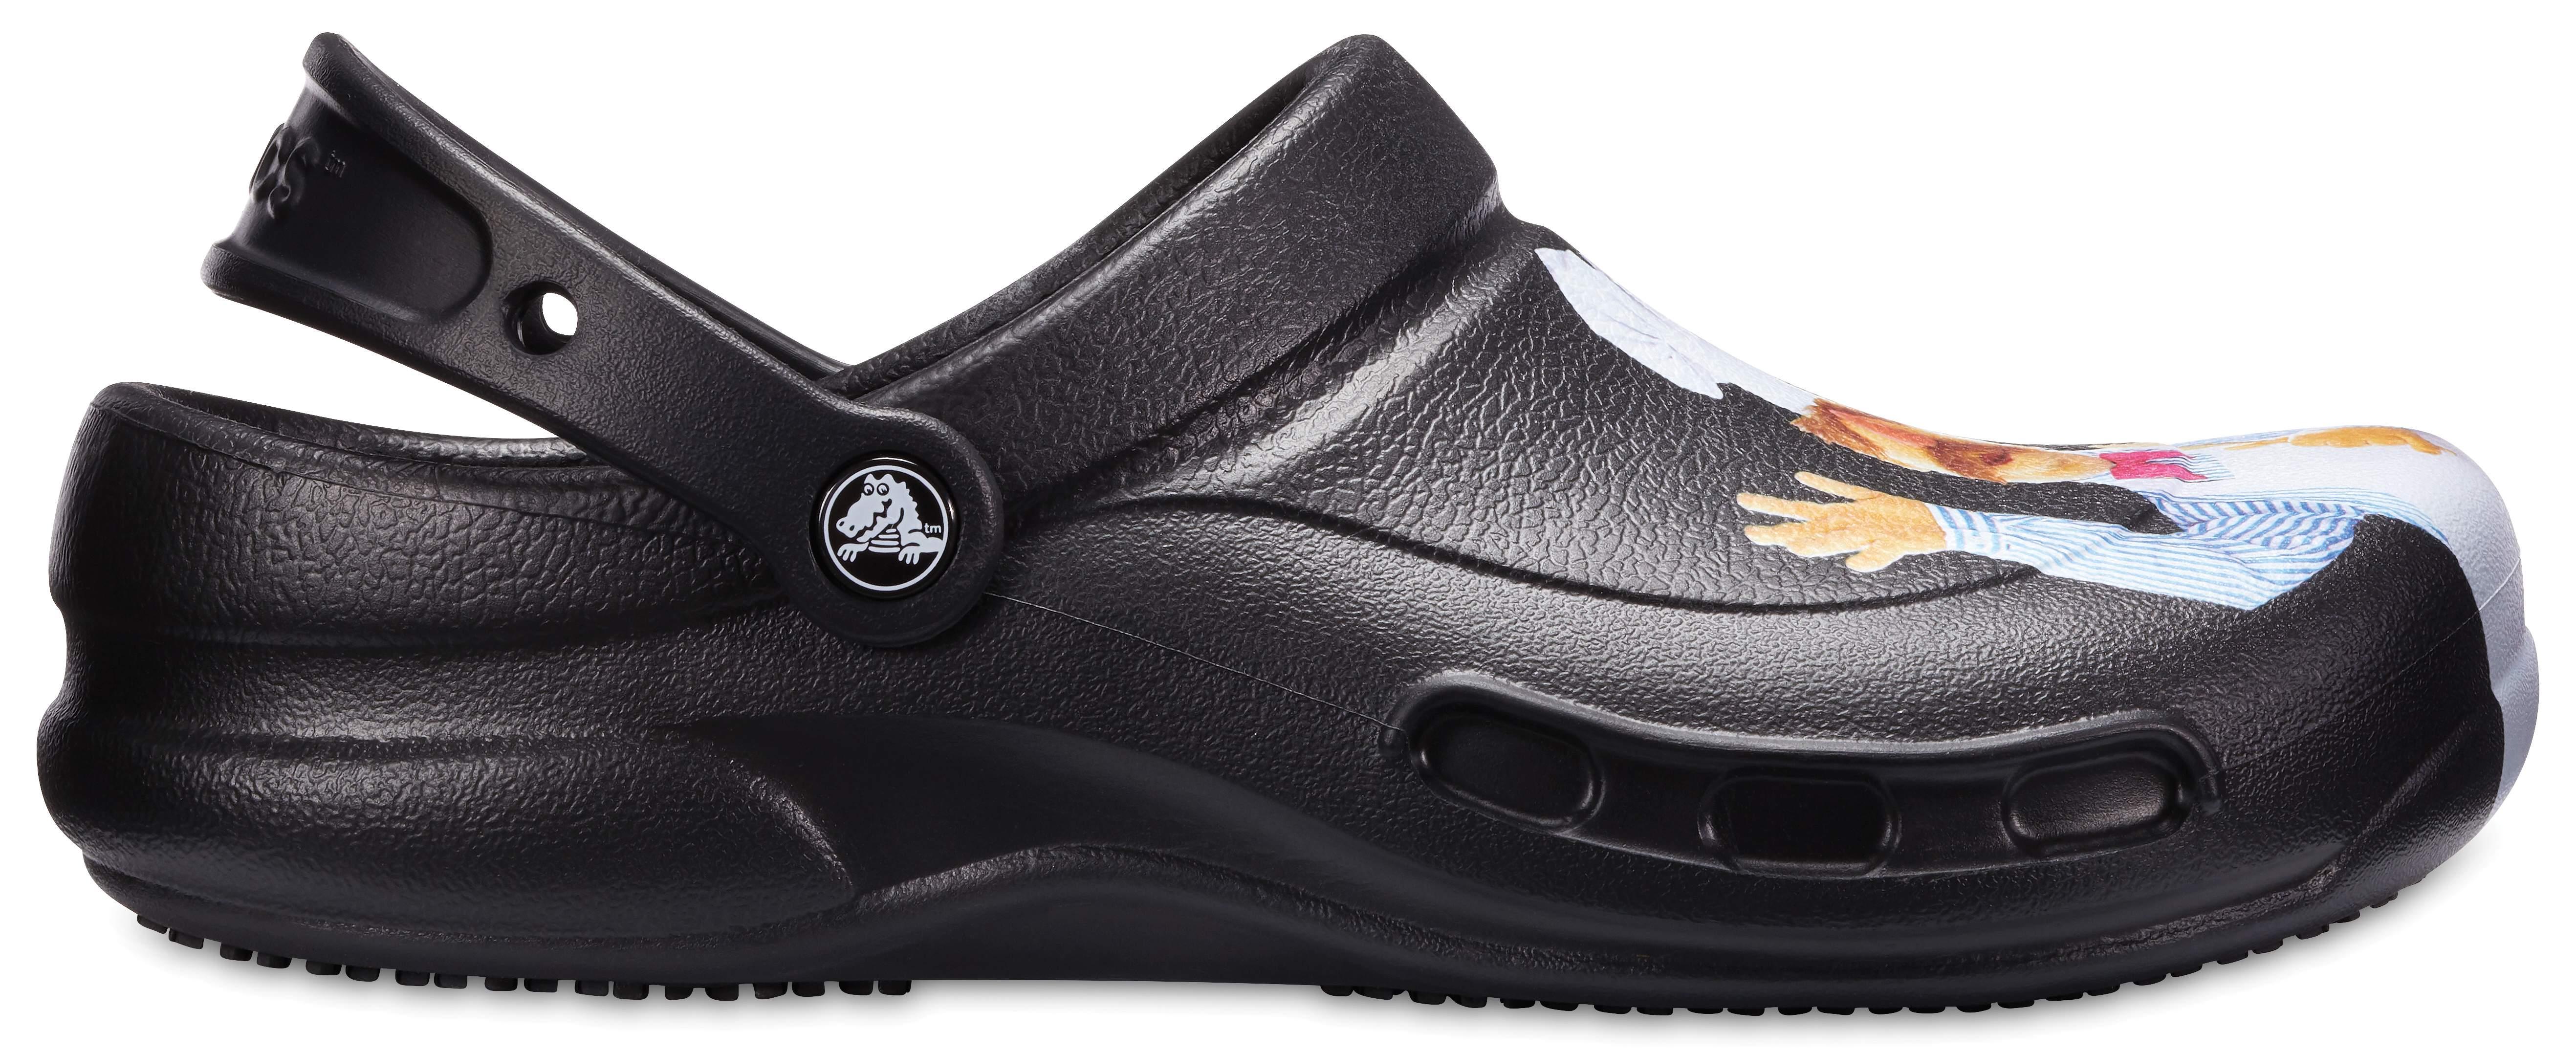 Crocs Navy Bistro Clogs 44